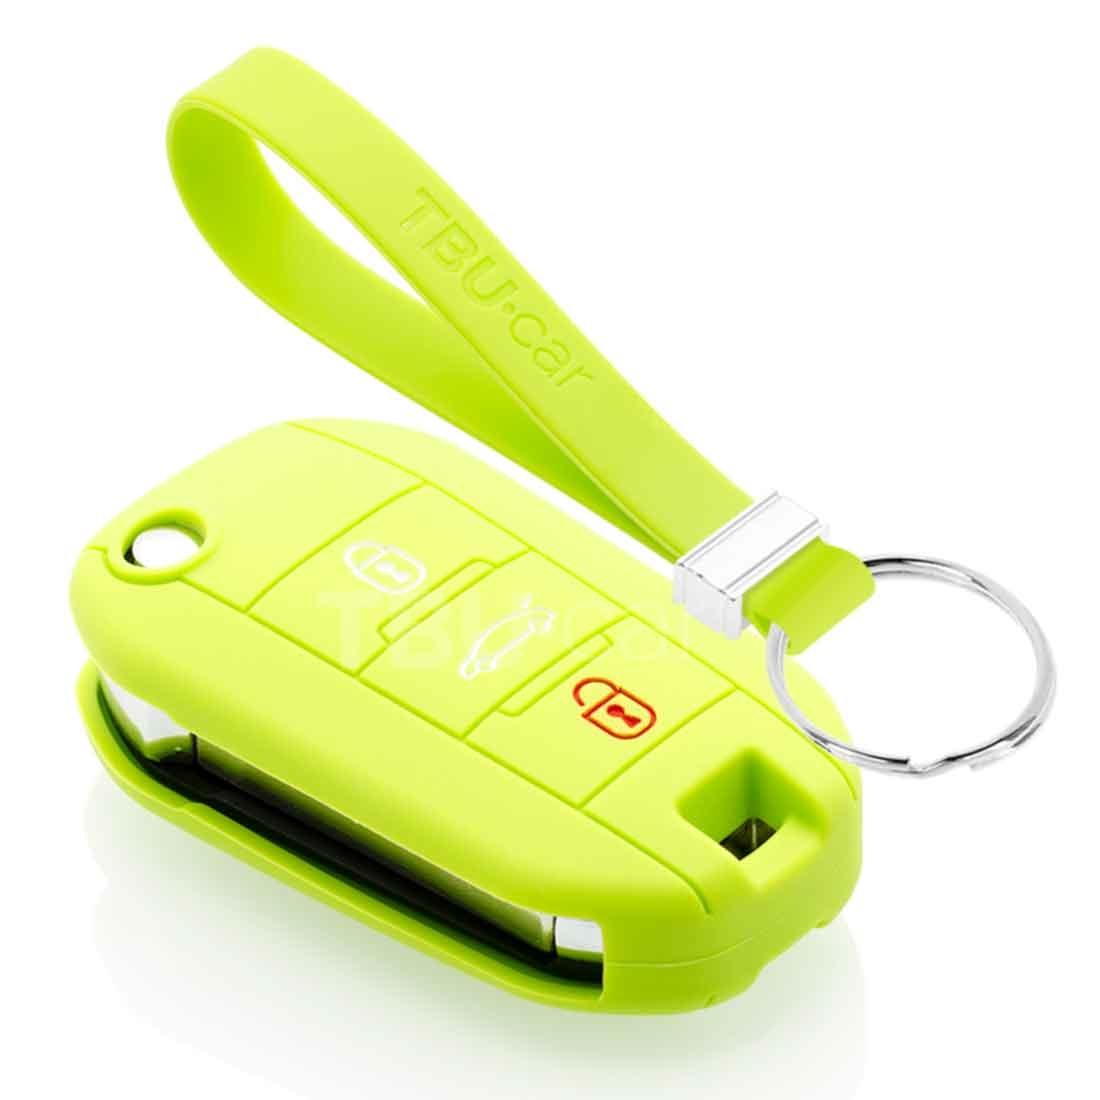 TBU car TBU car Autoschlüssel Hülle kompatibel mit Citroën 3 Tasten - Schutzhülle aus Silikon - Auto Schlüsselhülle Cover in Lindgrün